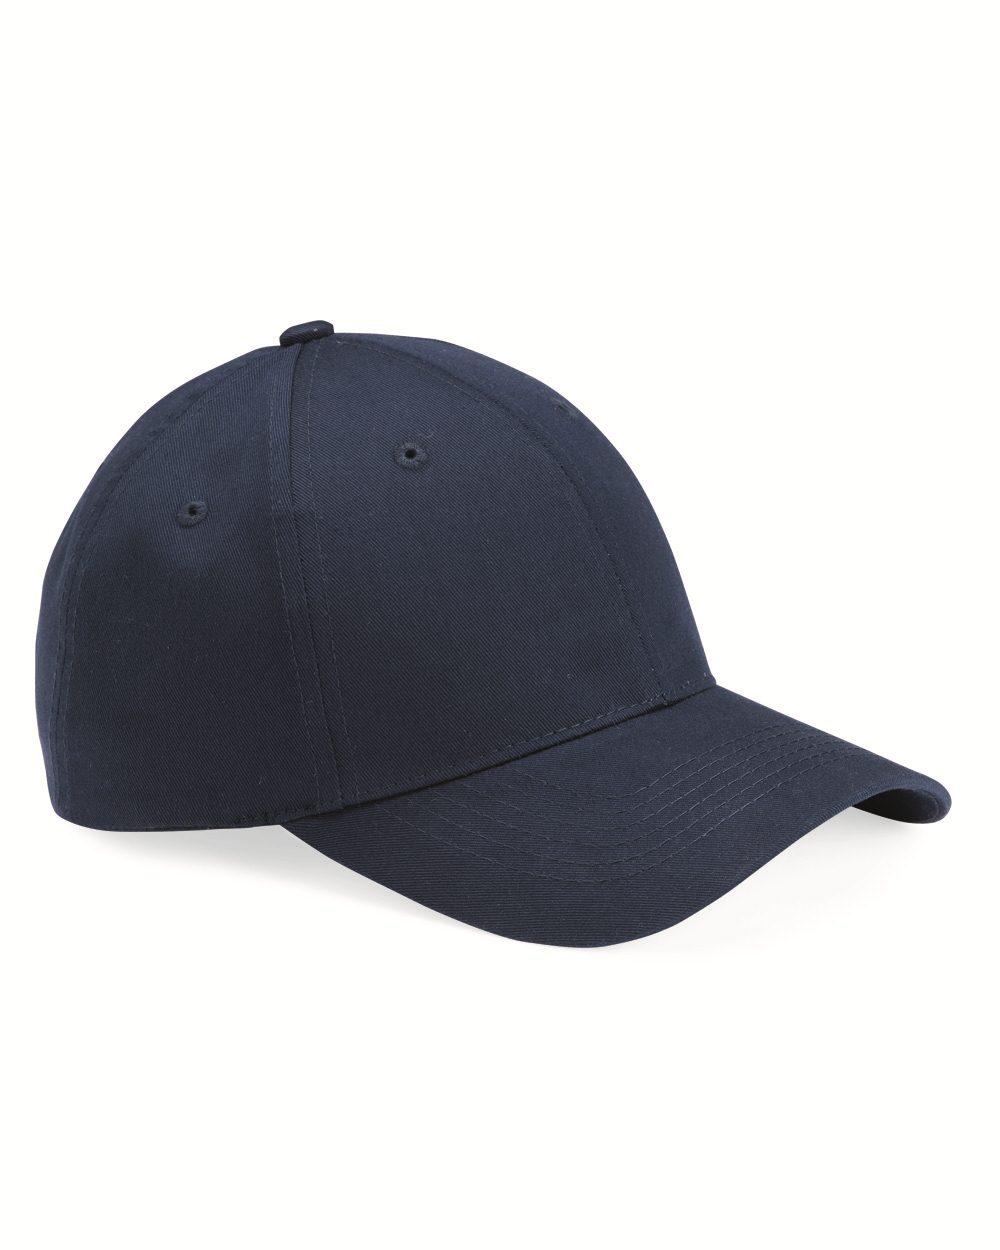 Sportsman 2260 - Twill Cotton Cap